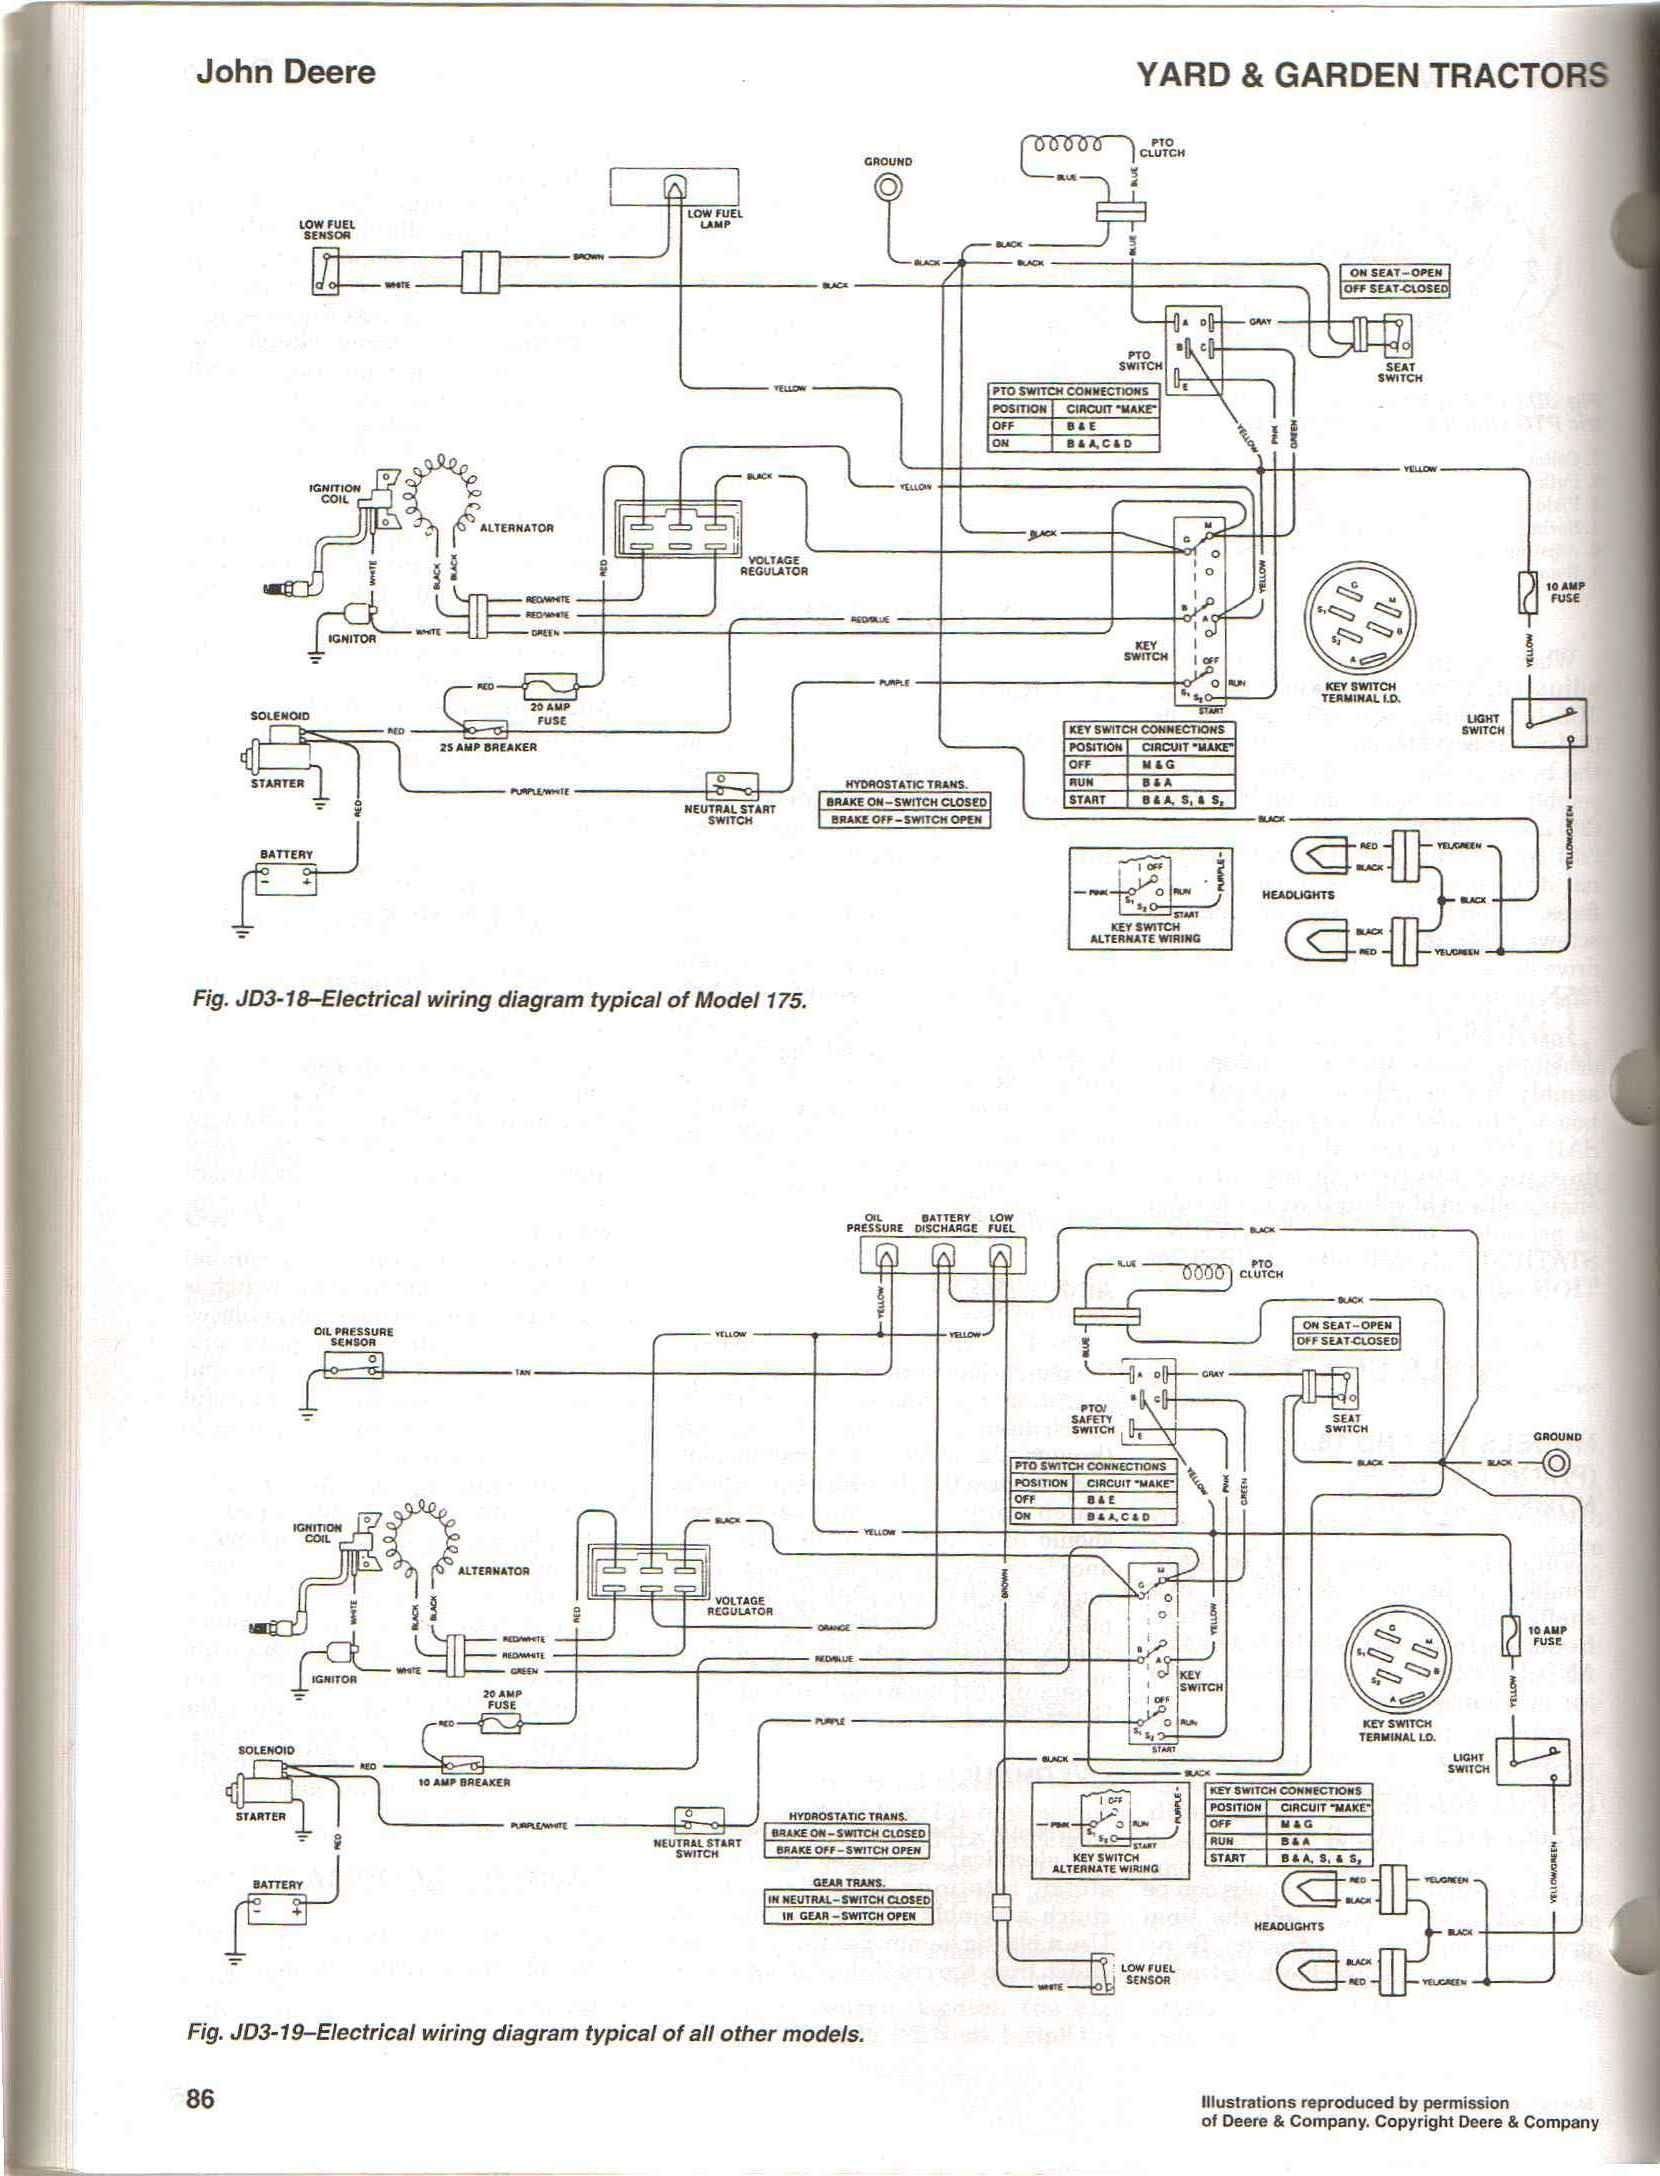 hight resolution of john deere 185 wiring diagram diagram data schema john deere 185 hydro wiring diagram john deere 185 wiring diagram